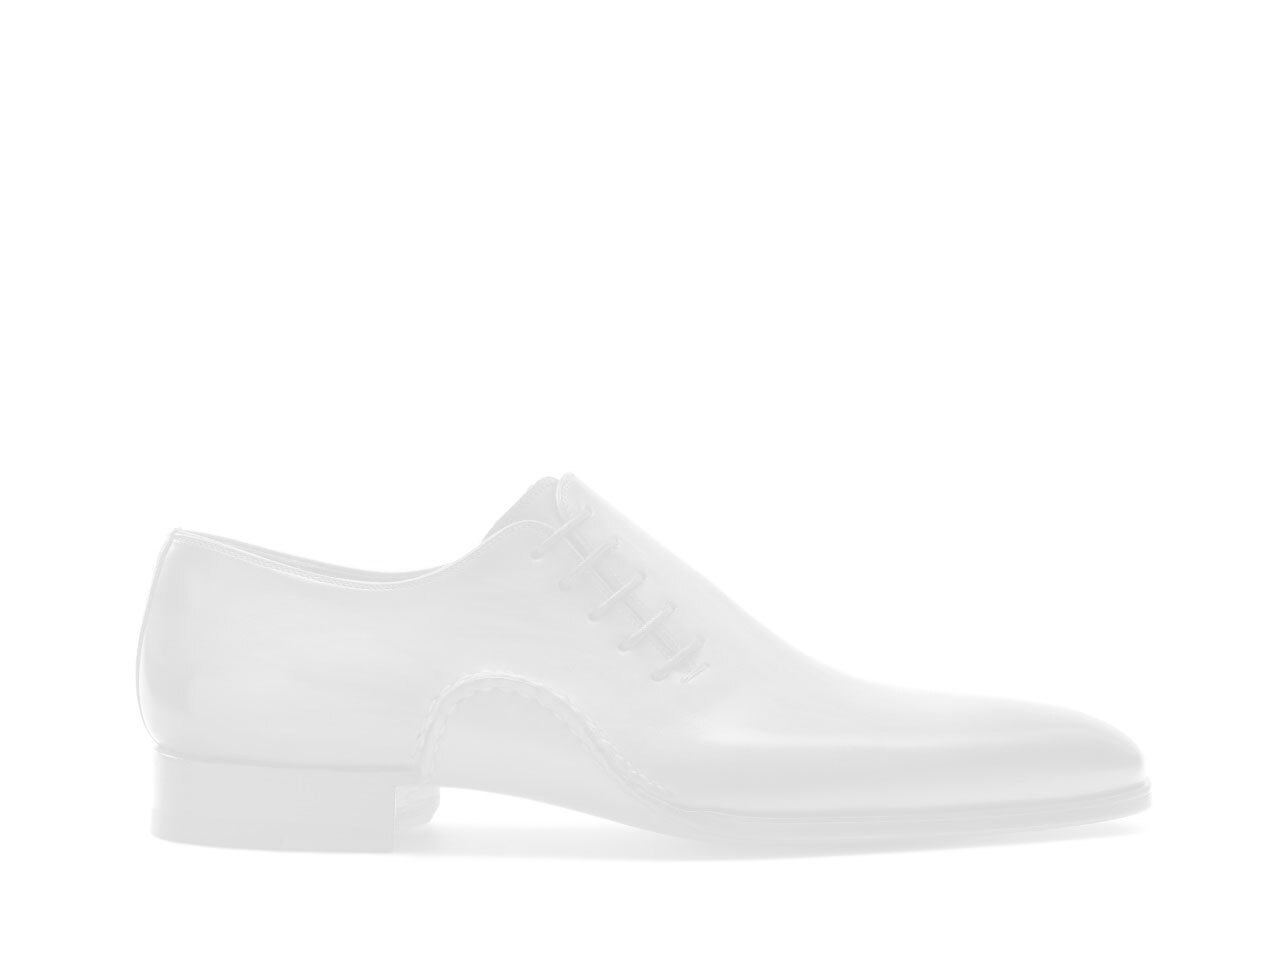 Sole of the Magnanni Coto Lo Cognac Men's Sneakers